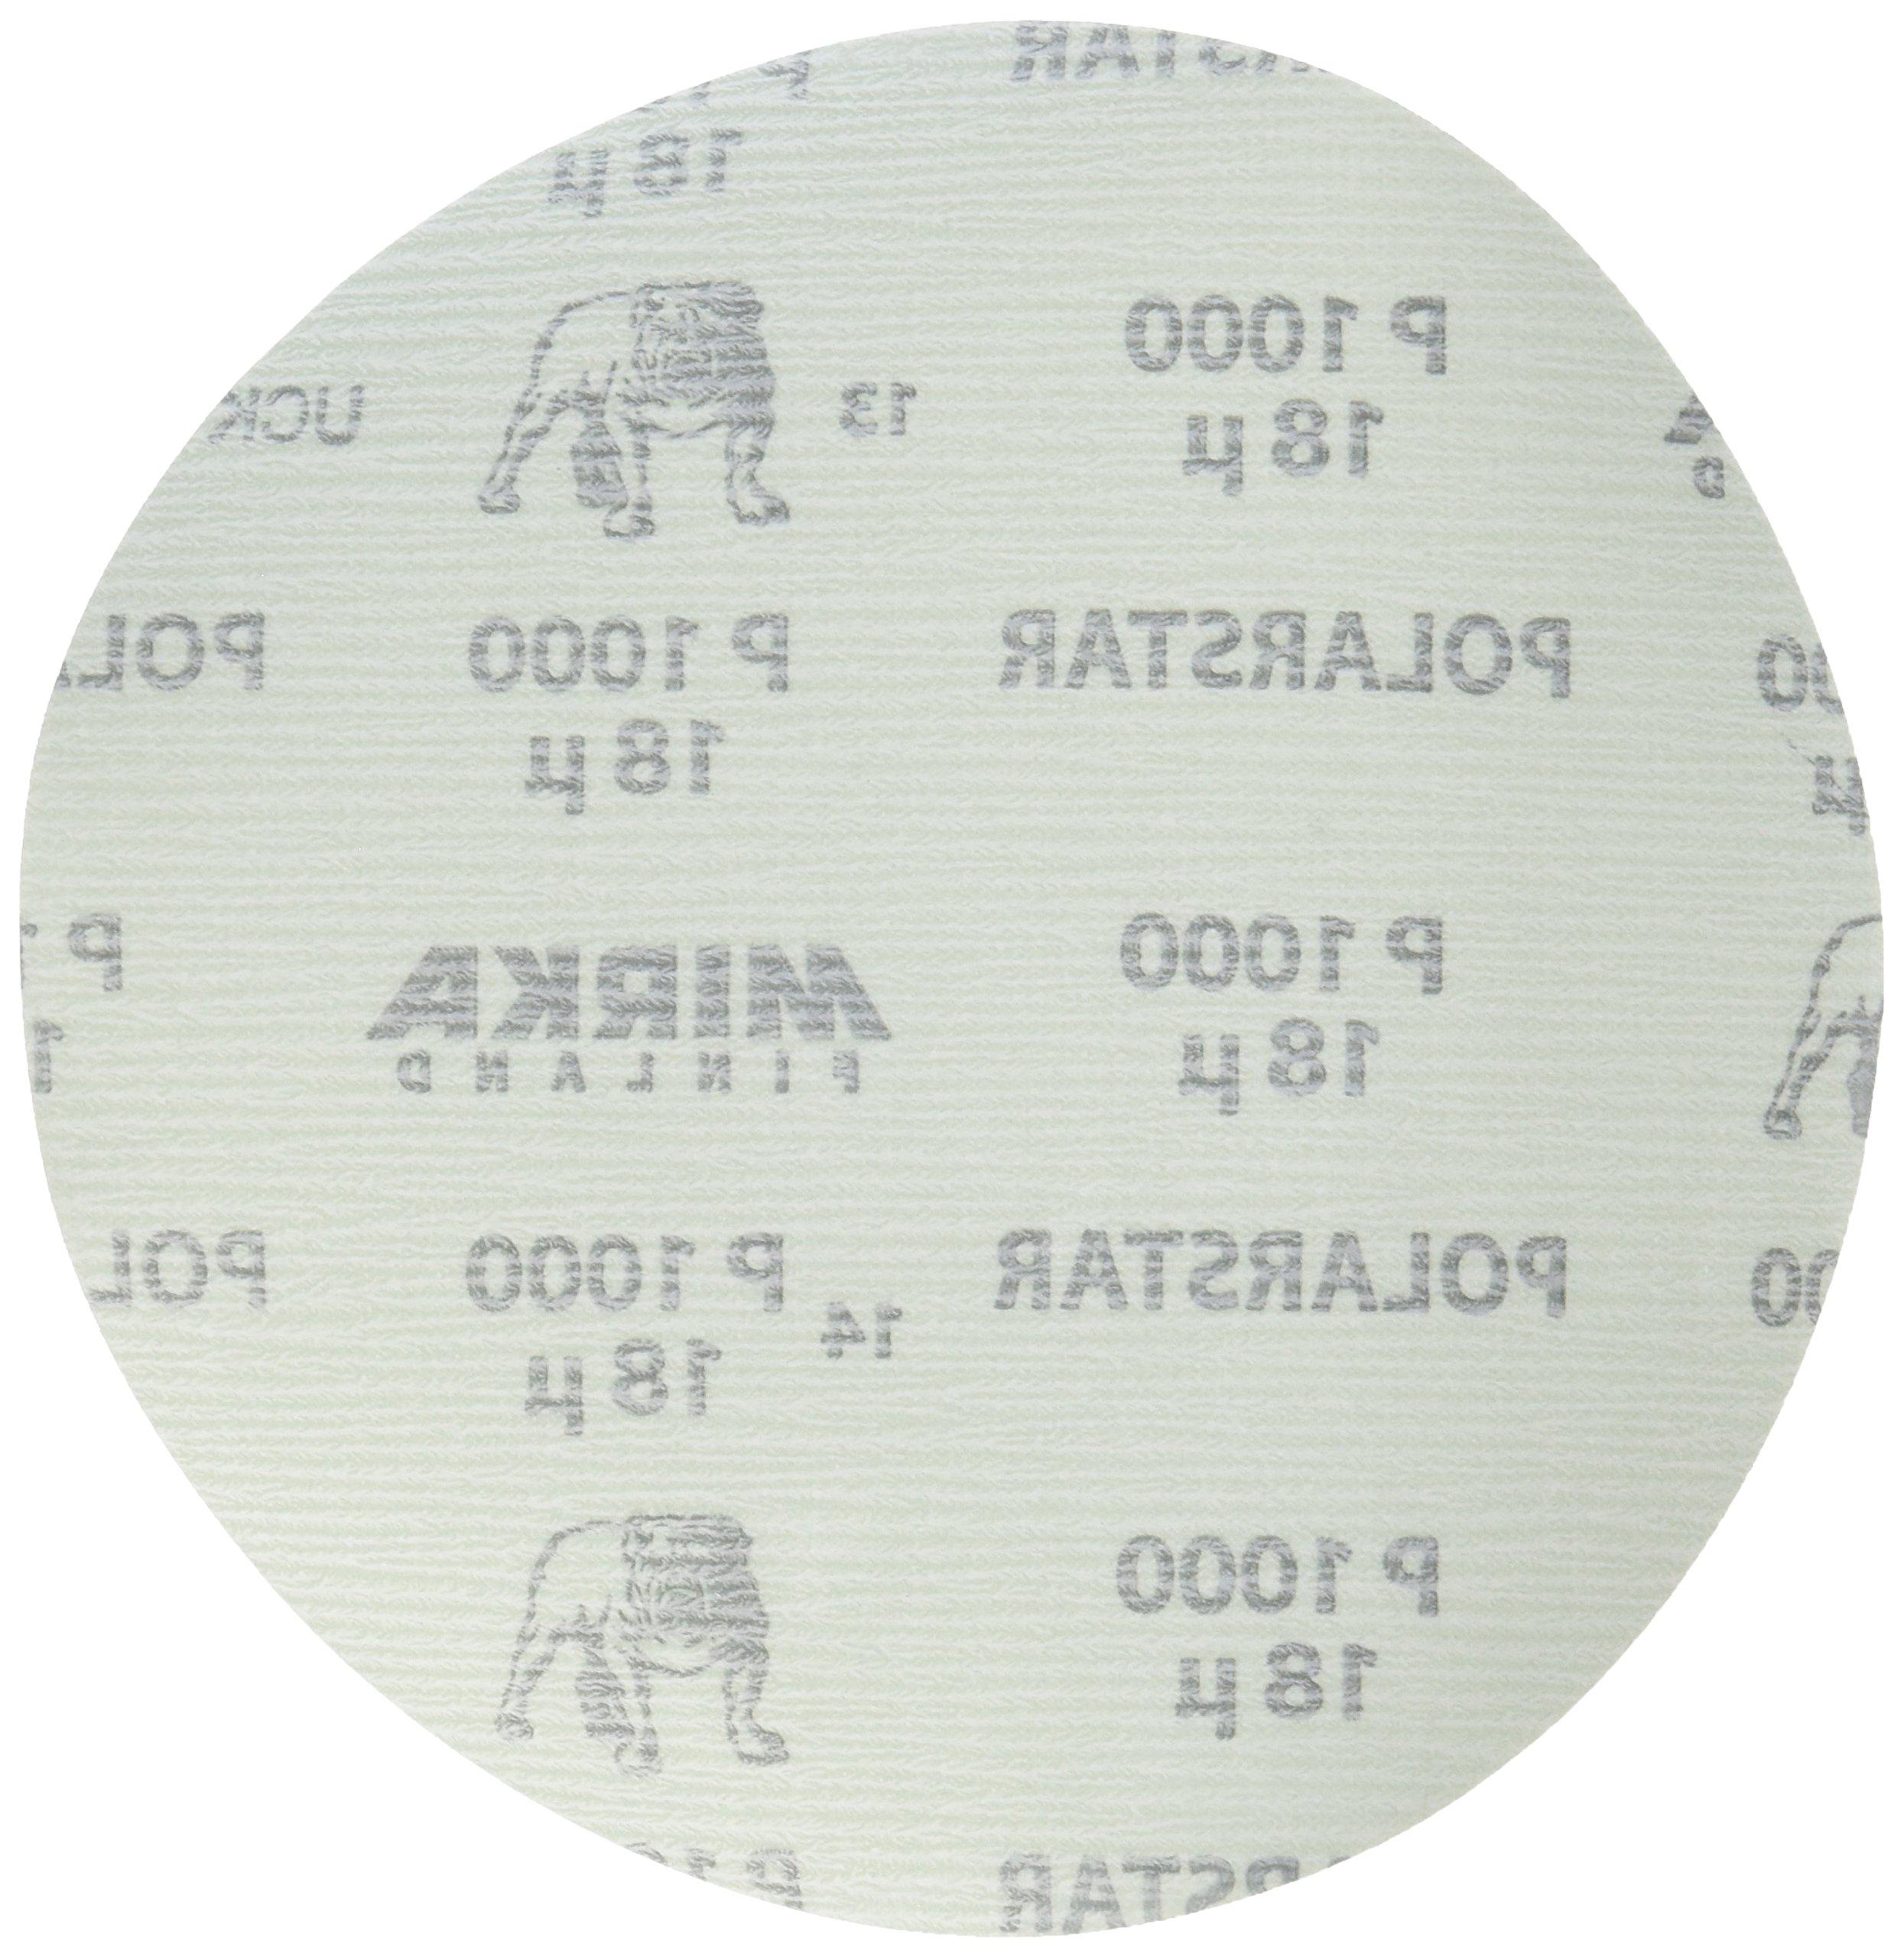 Mirka FA62205092 Polarstar Grip Disc